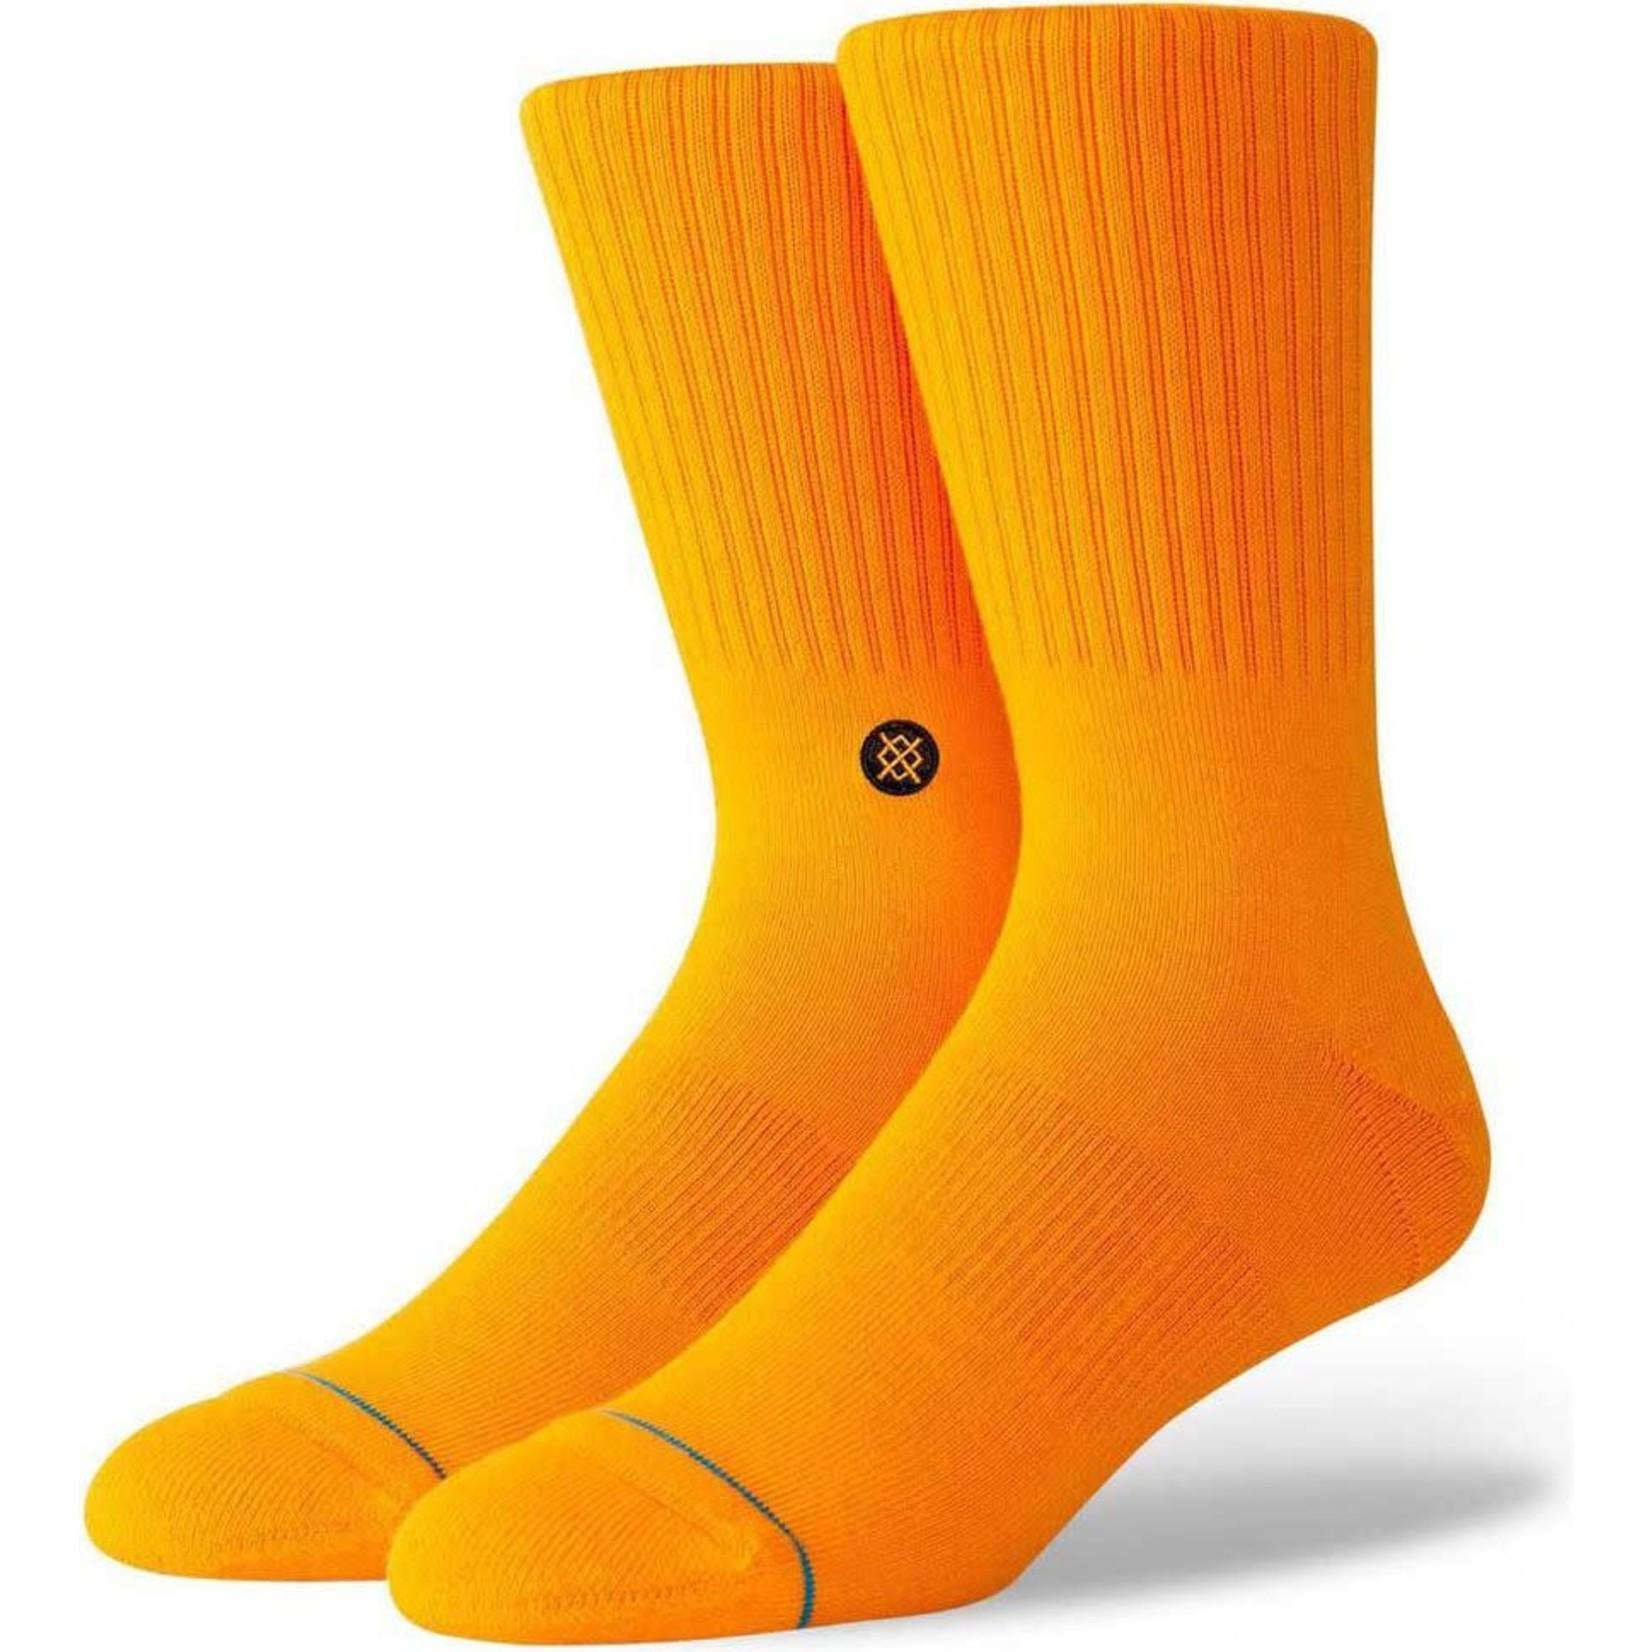 Stance Stance Socks, Icon